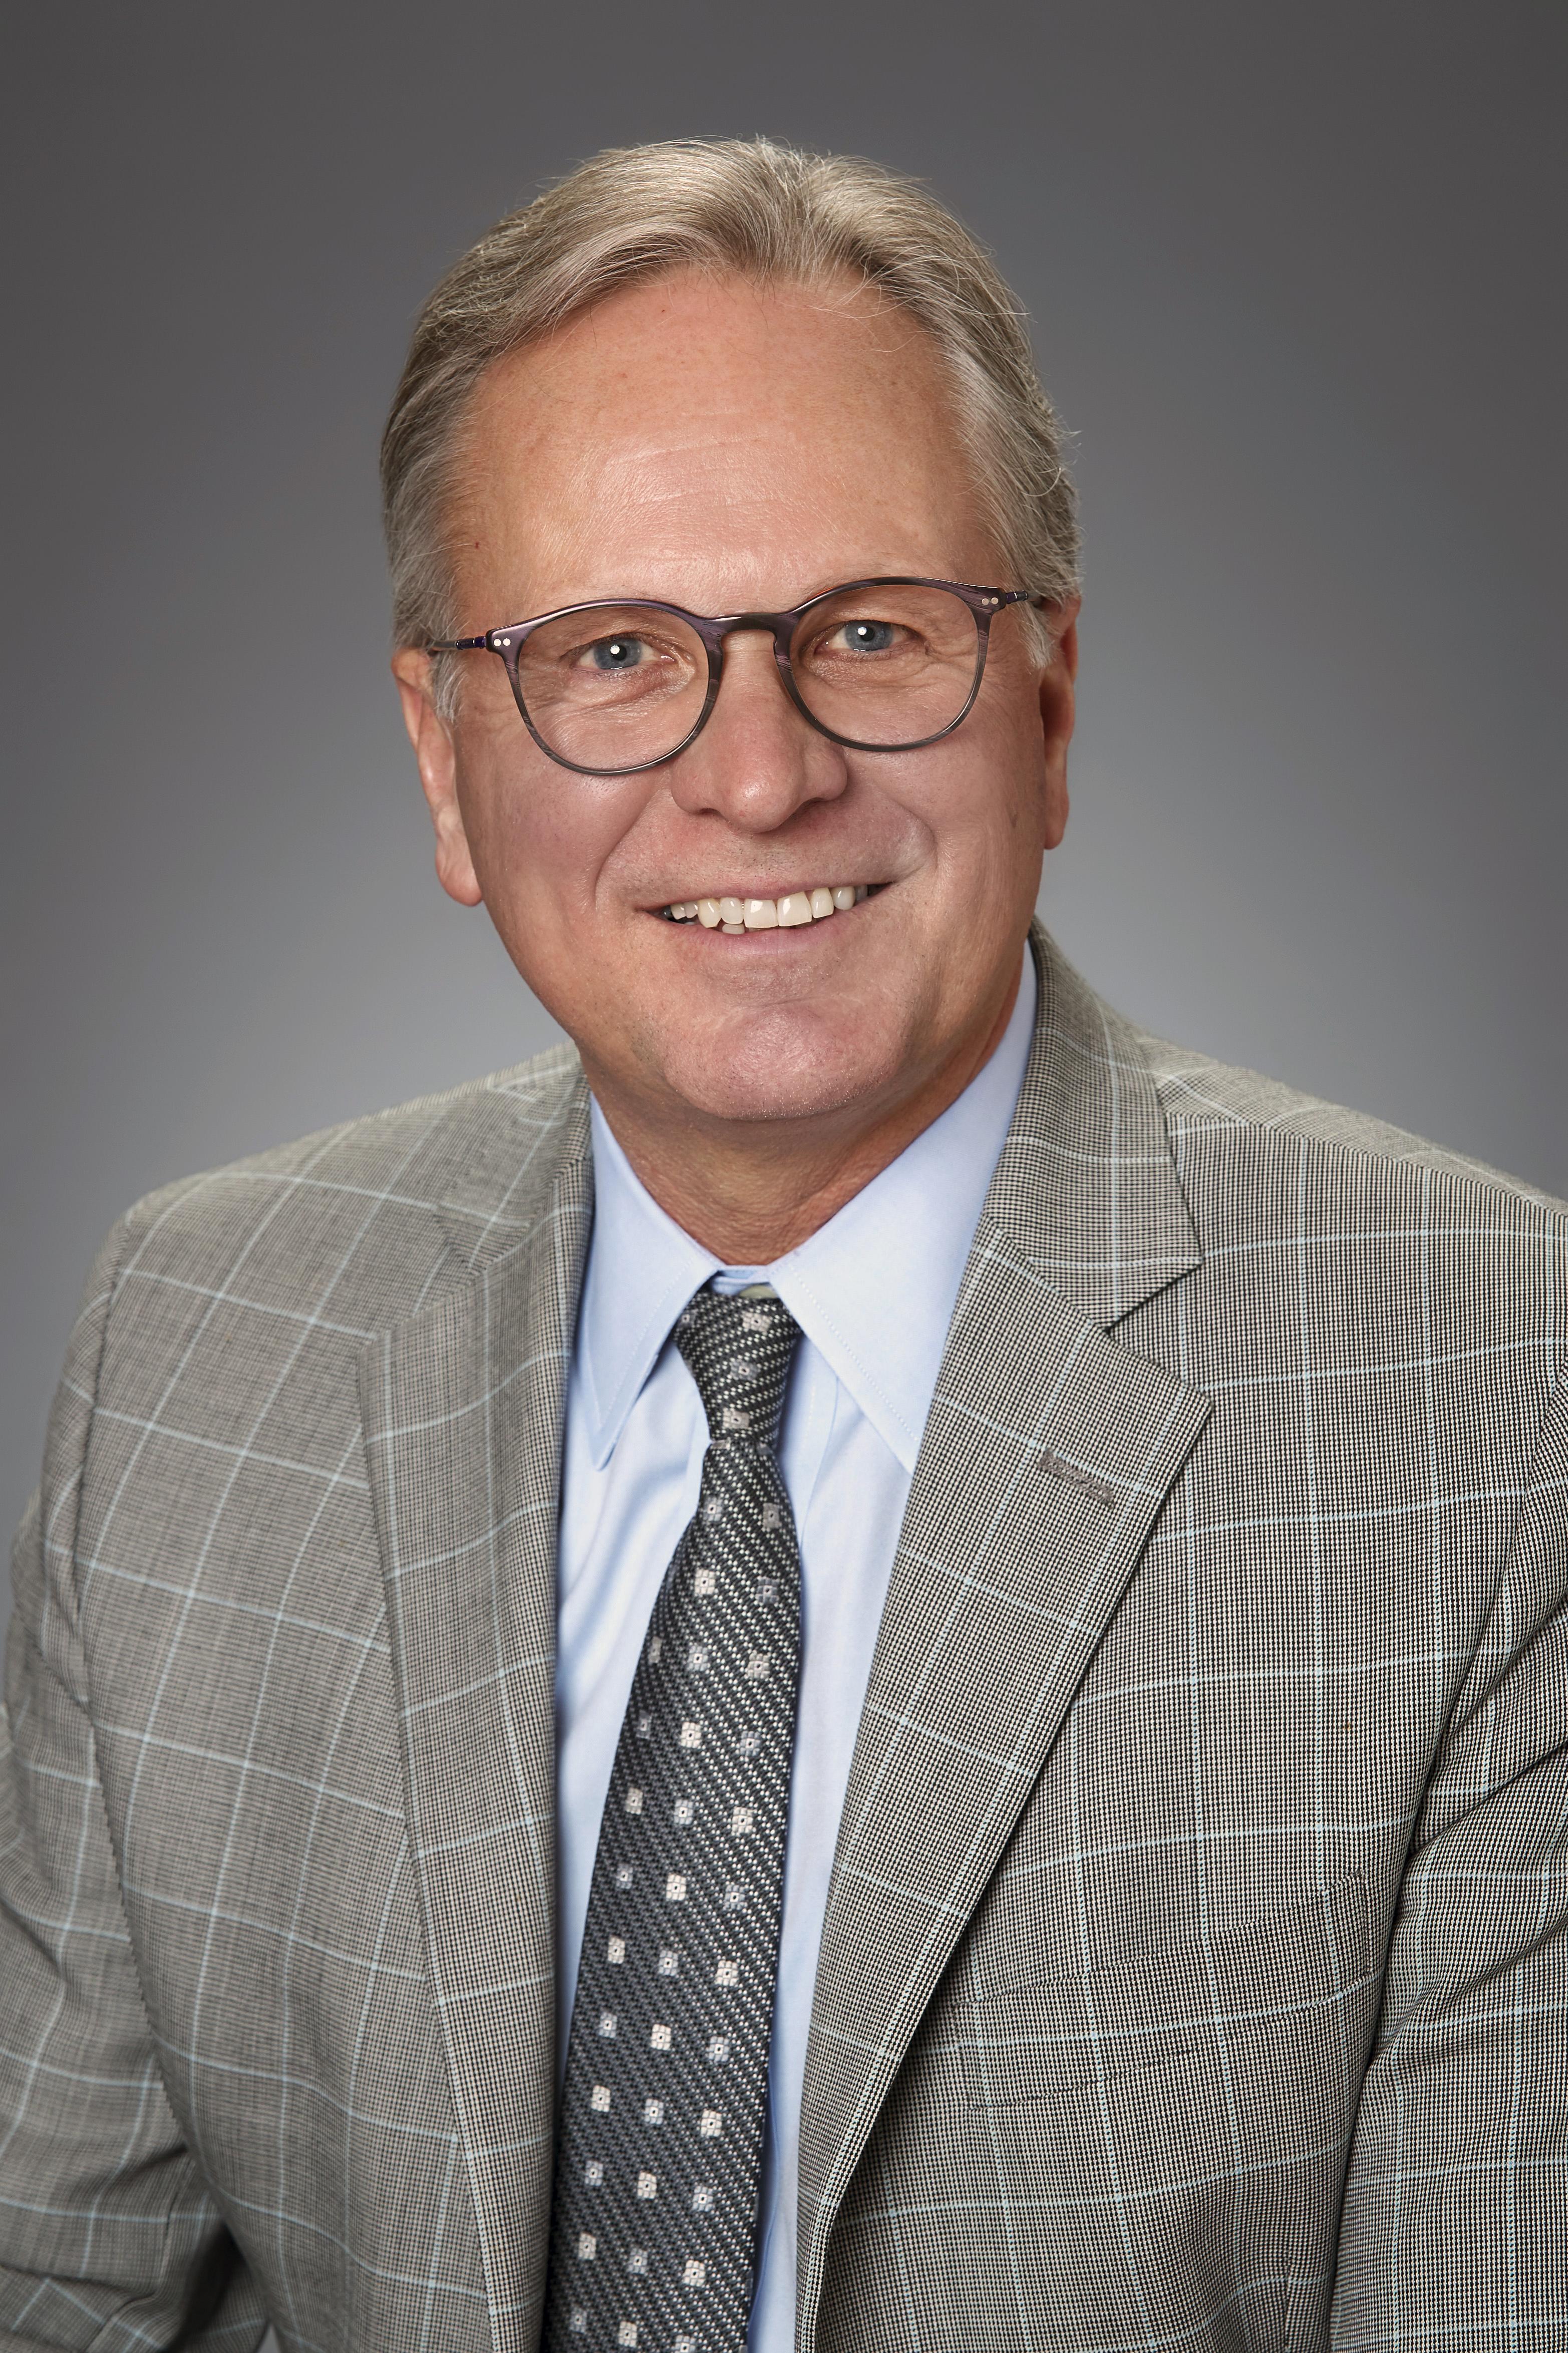 Portrait of DC president, Don Lovisa.